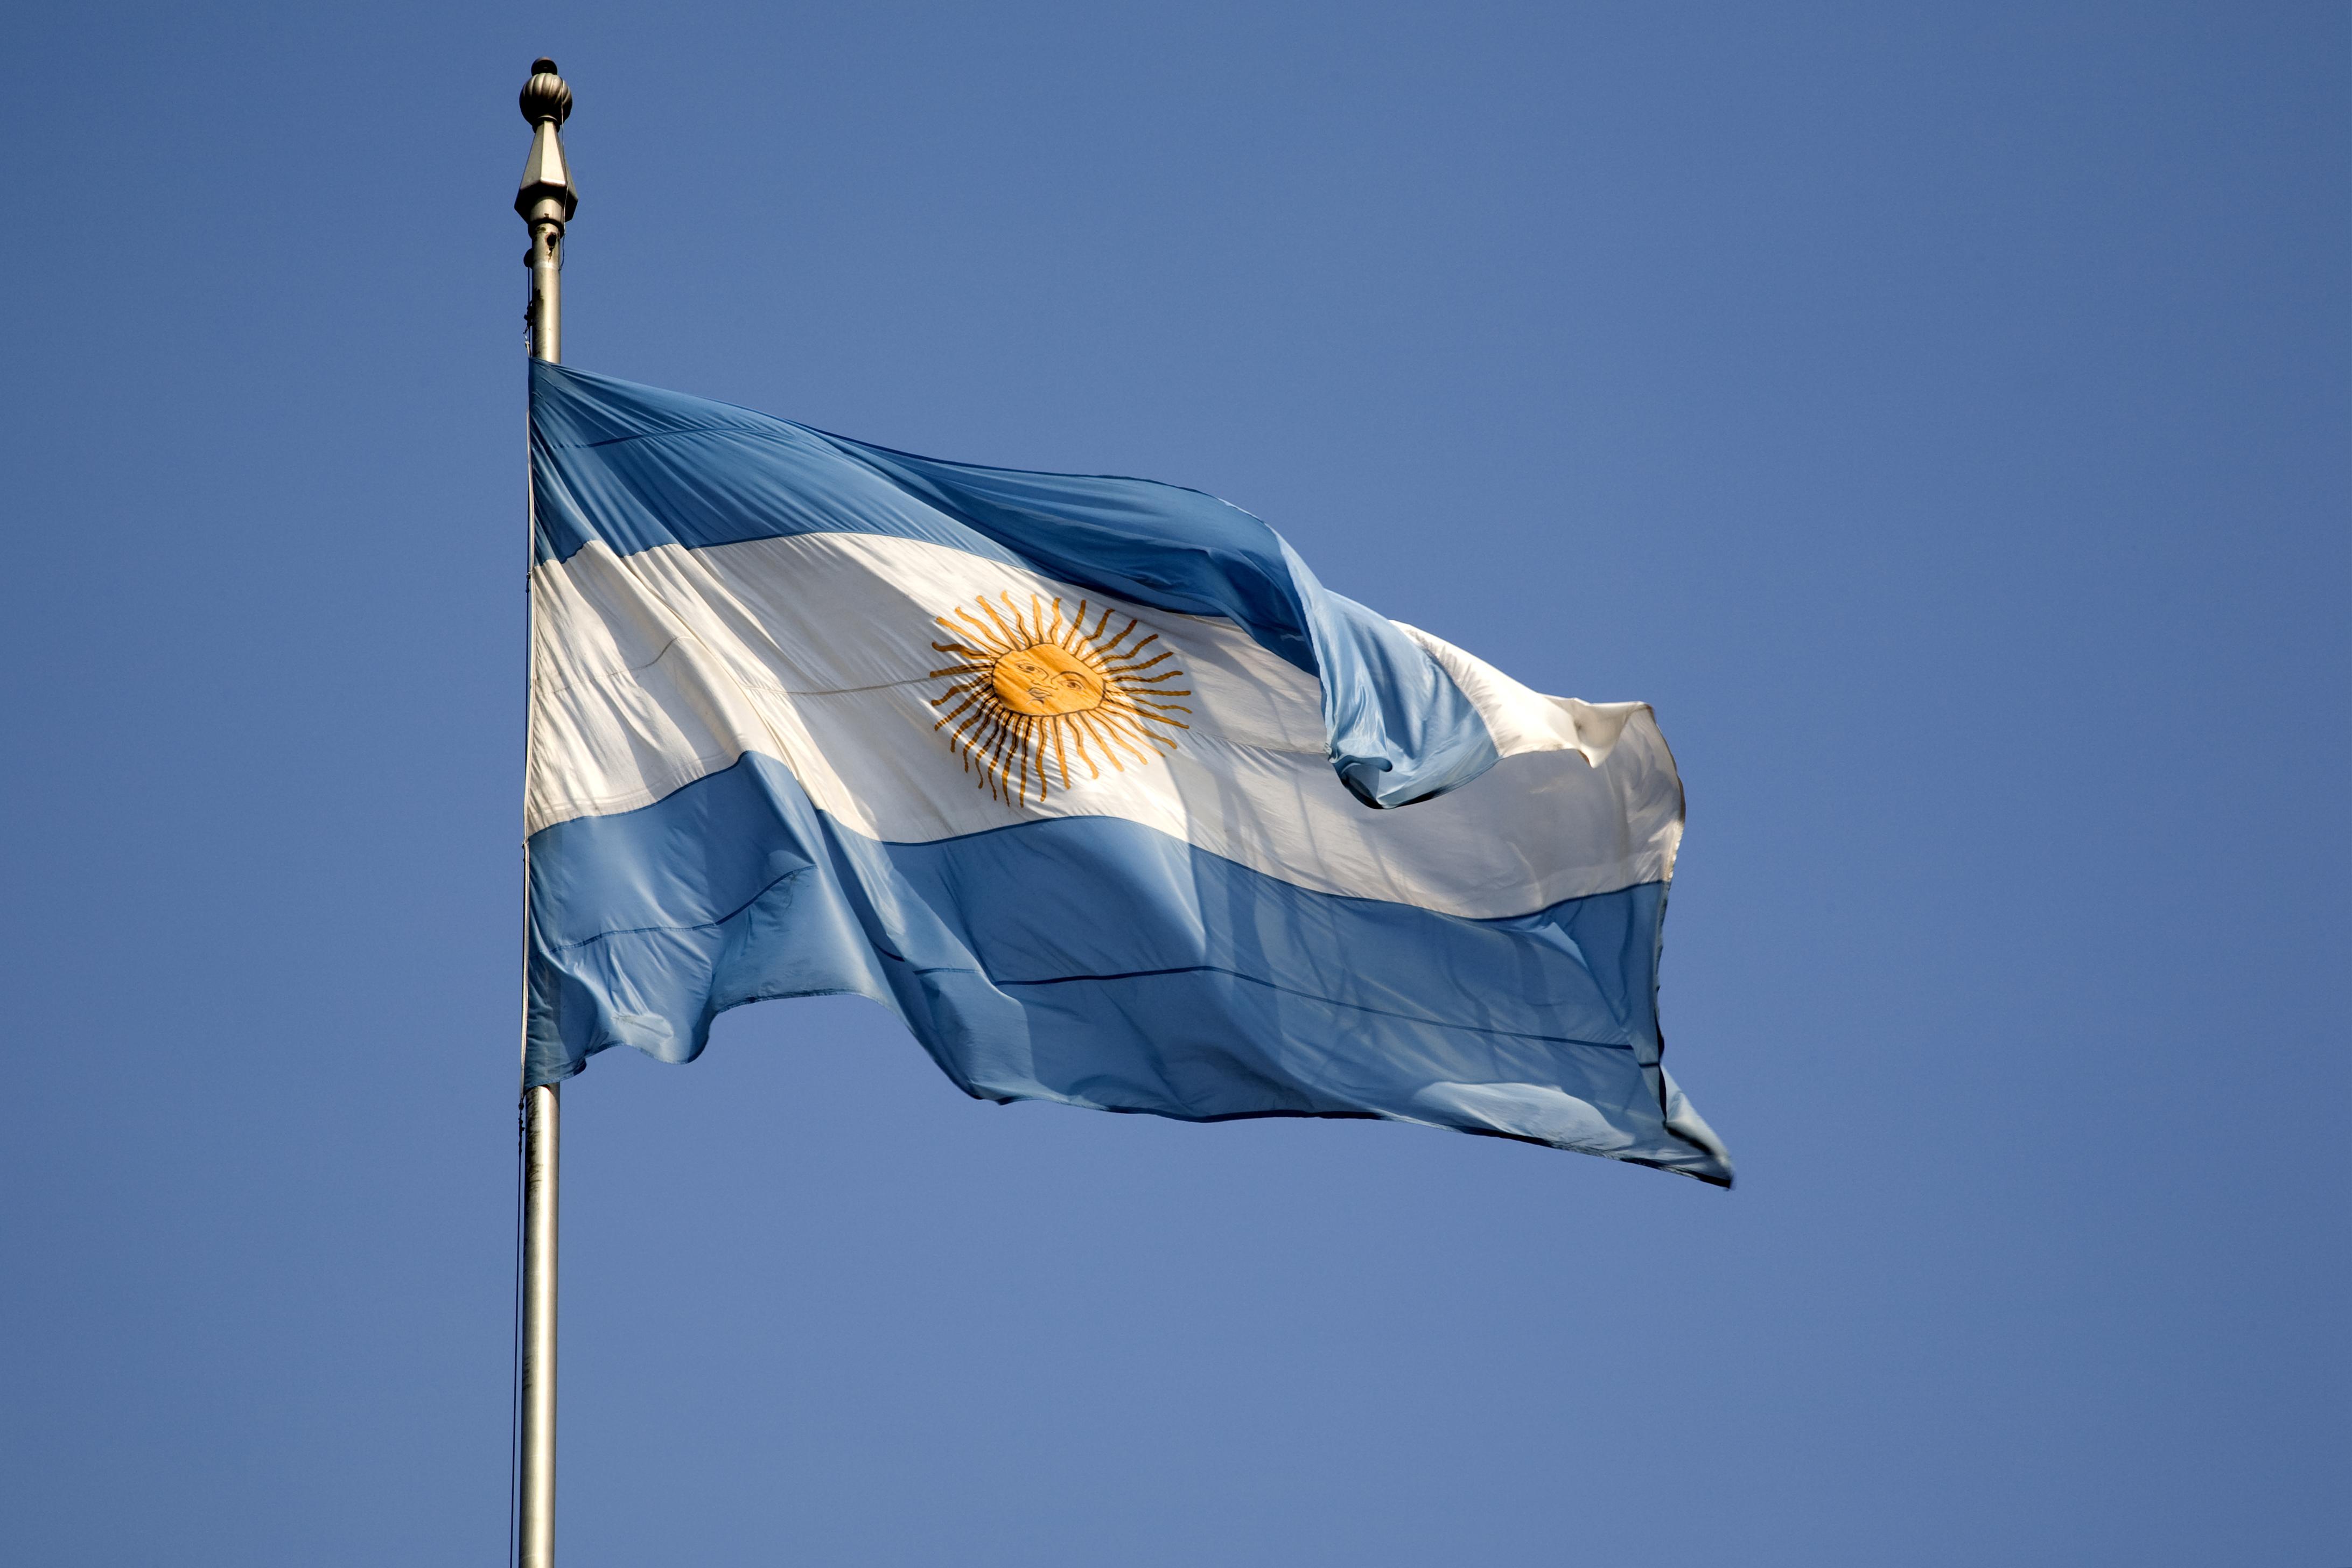 Argentina 3pl Supply Chain Global Logistics Company Crane Worldwide Logistics